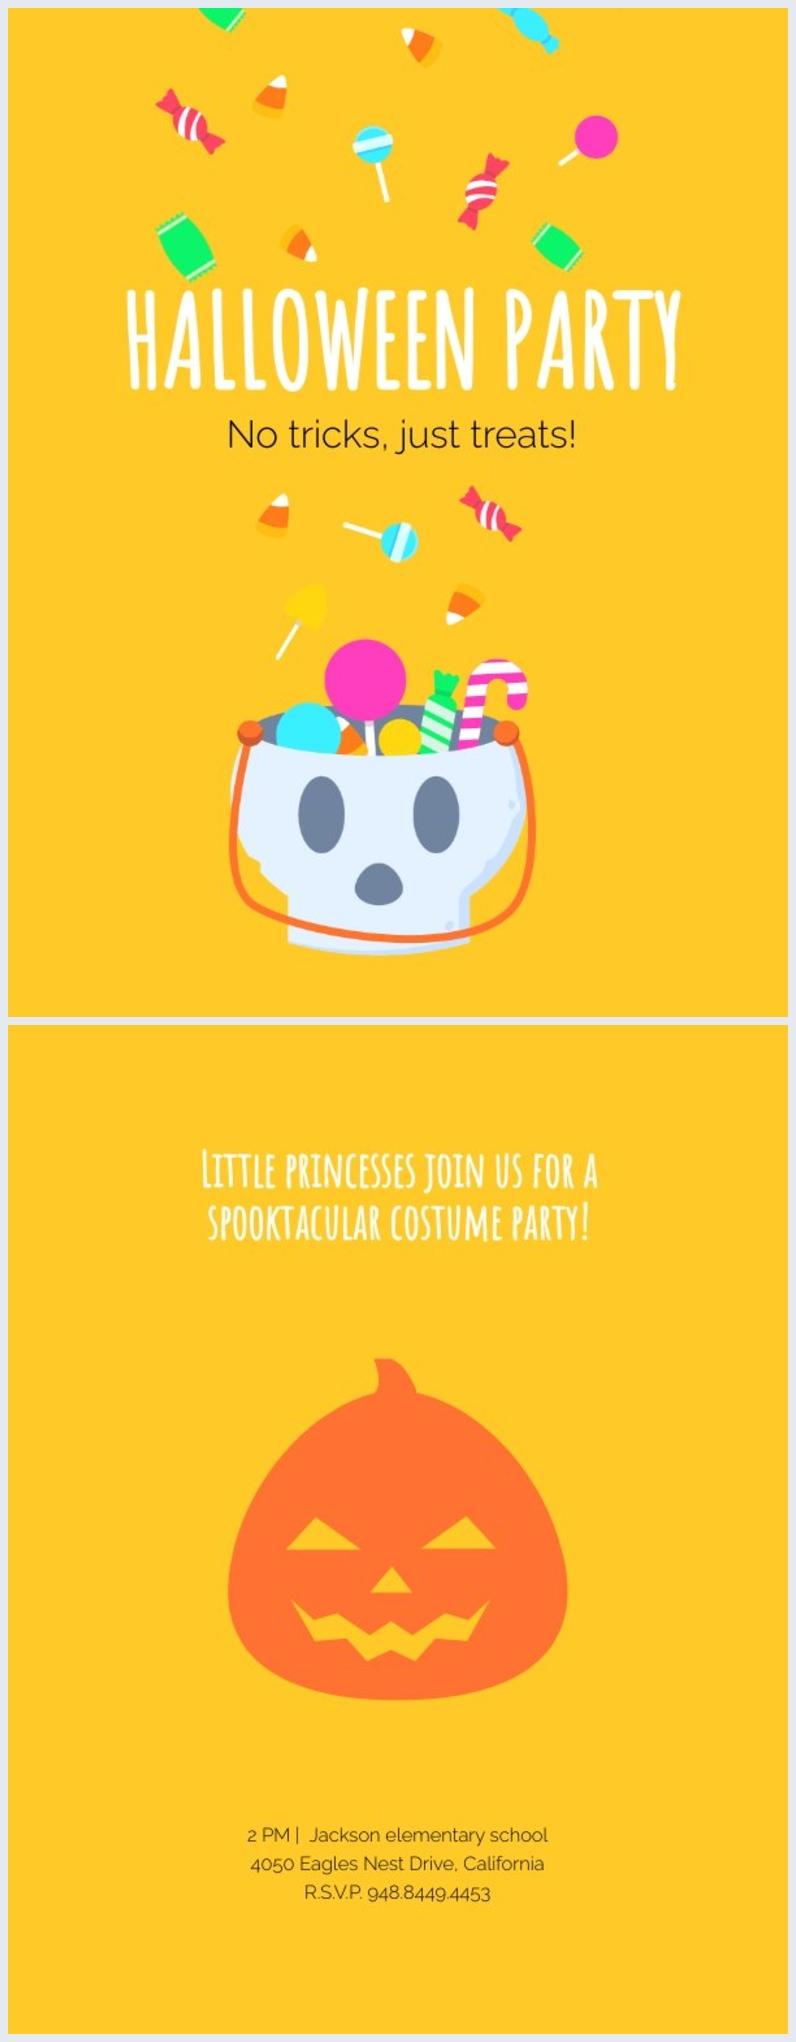 Diseño para invitación a fiesta infantil de Halloween